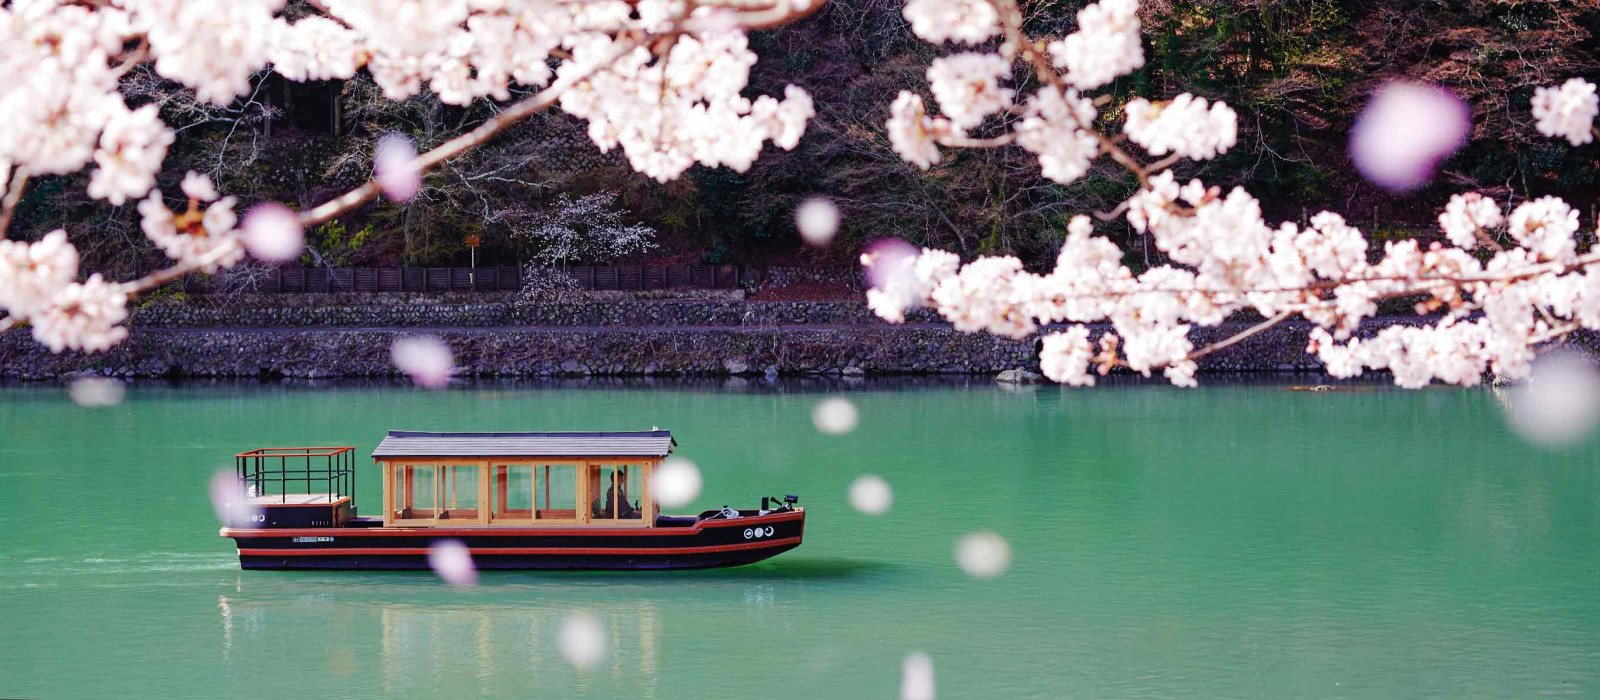 Hotel Hoshinoya Kyoto Japan